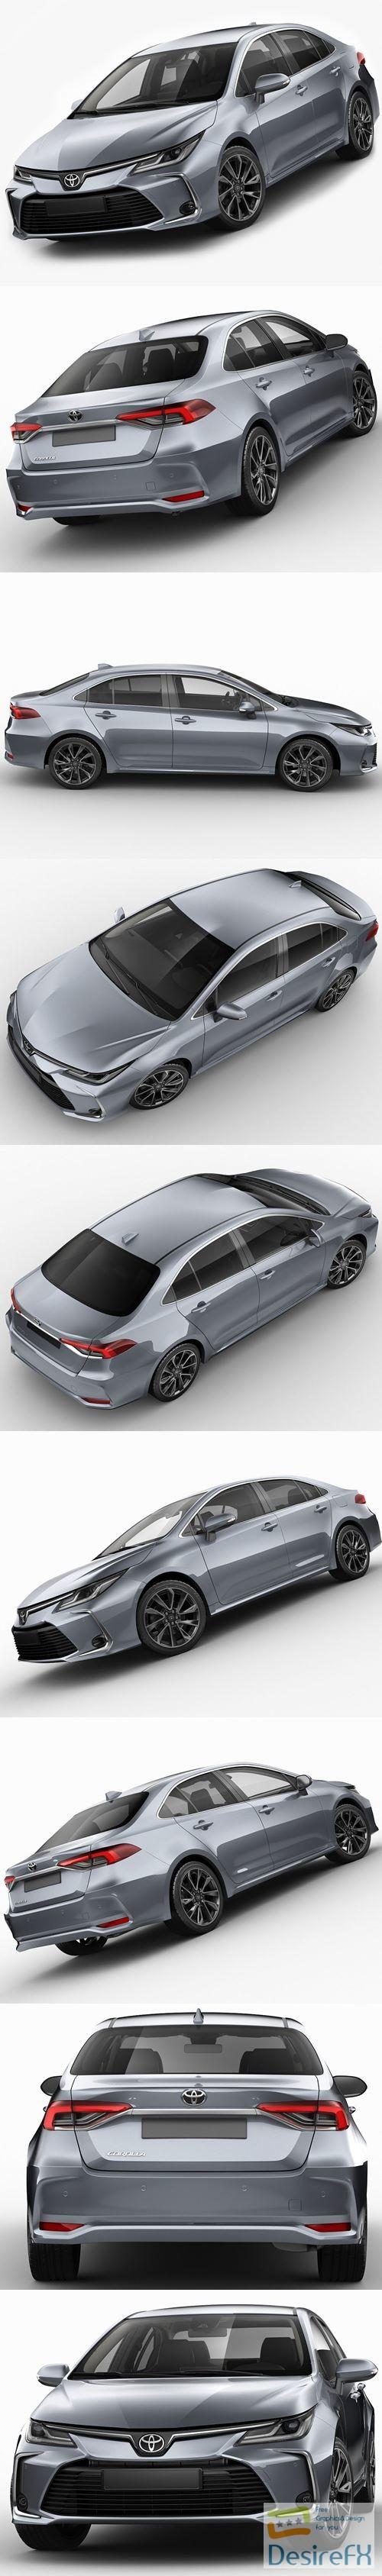 Toyota Corolla Sedan EU 2019 3D Model